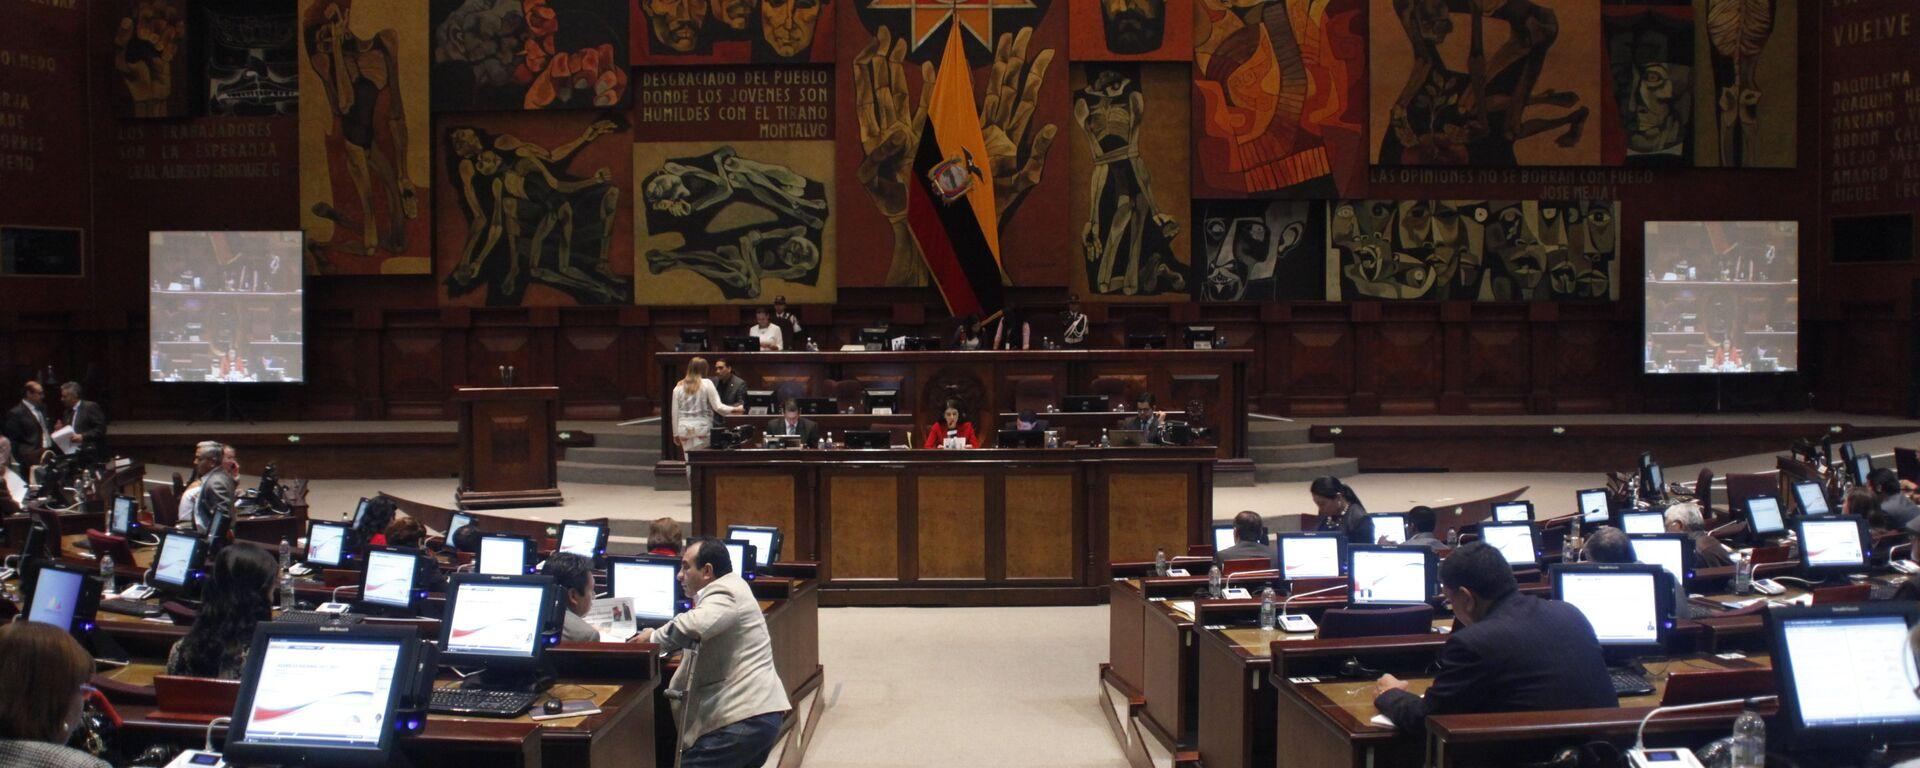 La Asamblea Nacional de Ecuador (archivo) - Sputnik Mundo, 1920, 15.05.2021